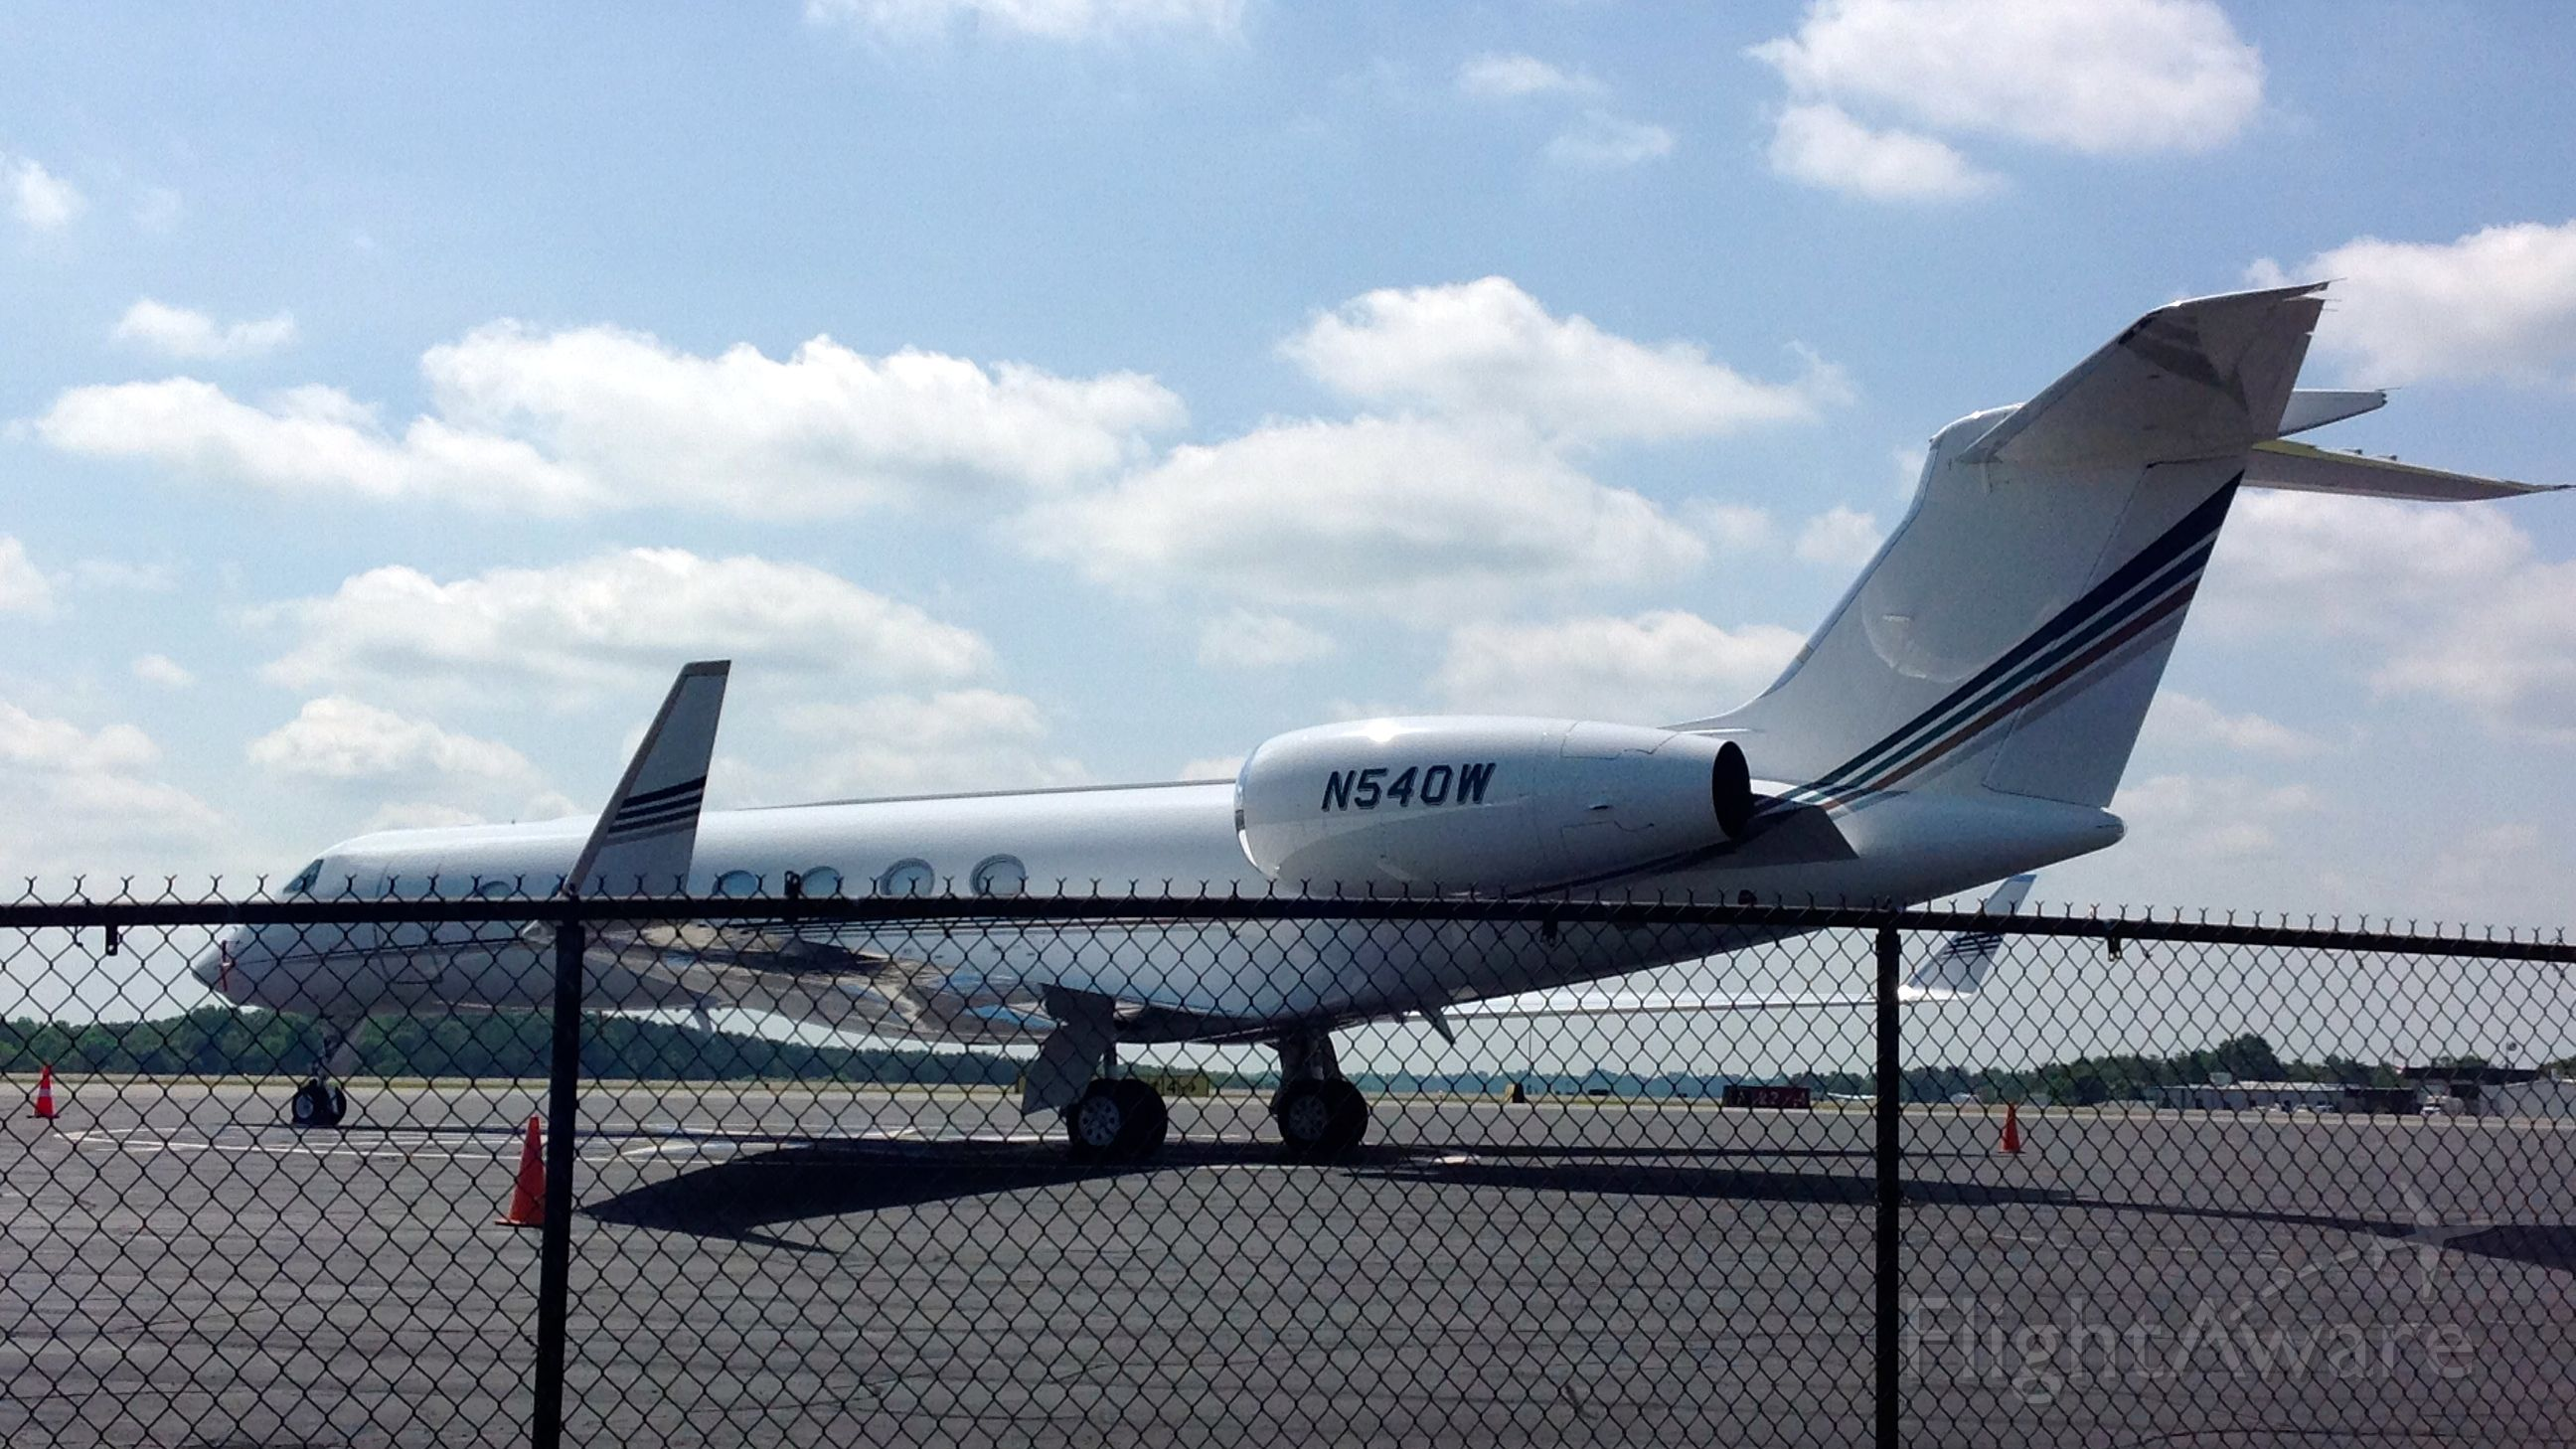 Gulfstream Aerospace Gulfstream V (N540W) - Oprah Winfrey in town for the funeral of Dr. Maya Angelou